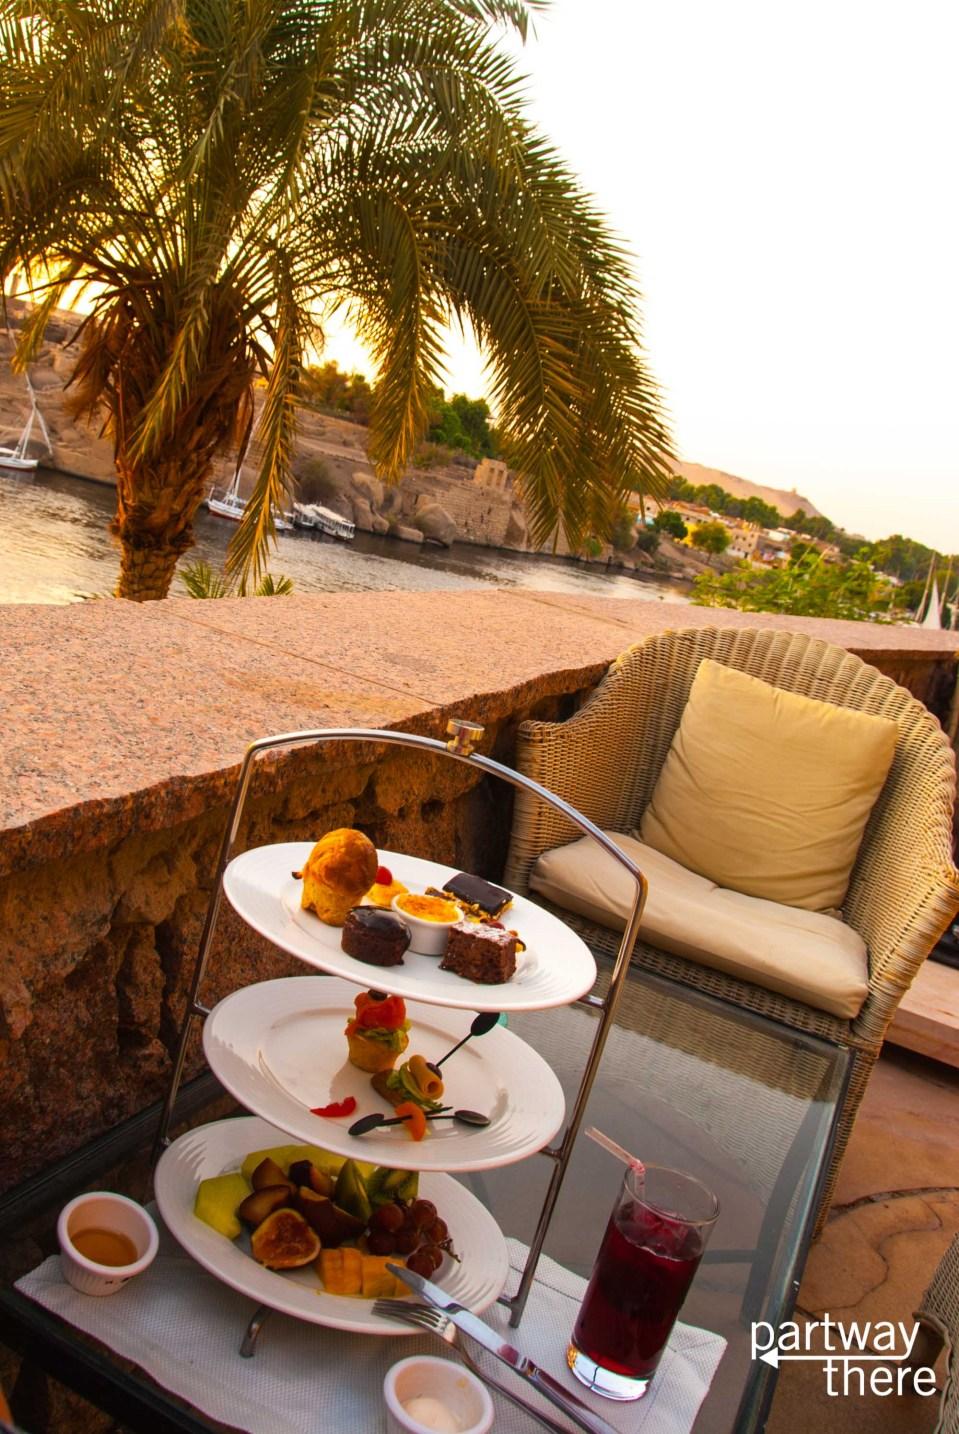 High Tea at the Old Cataract Hotel in Aswan, Egypt